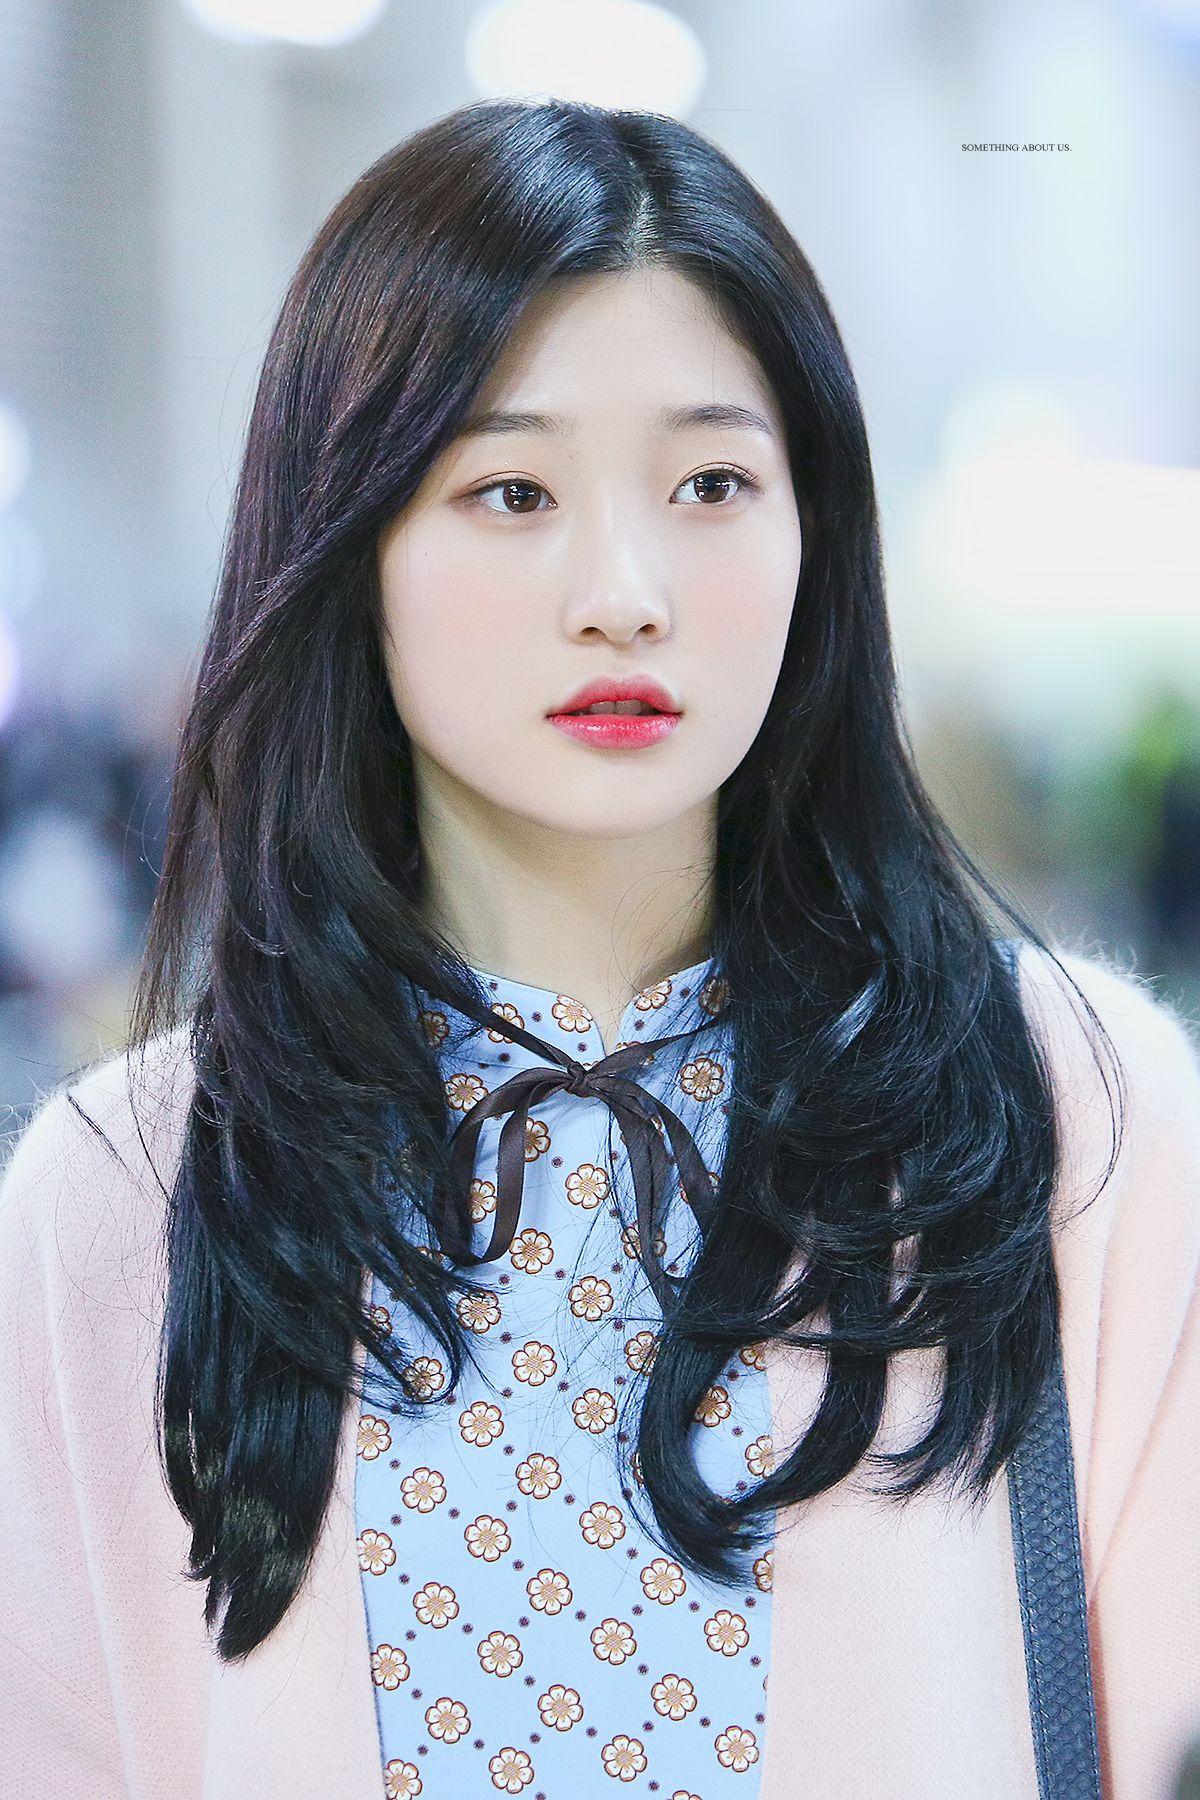 Chaeyeon Dia Chaeyeon Asian Beauty Jung Chaeyeon